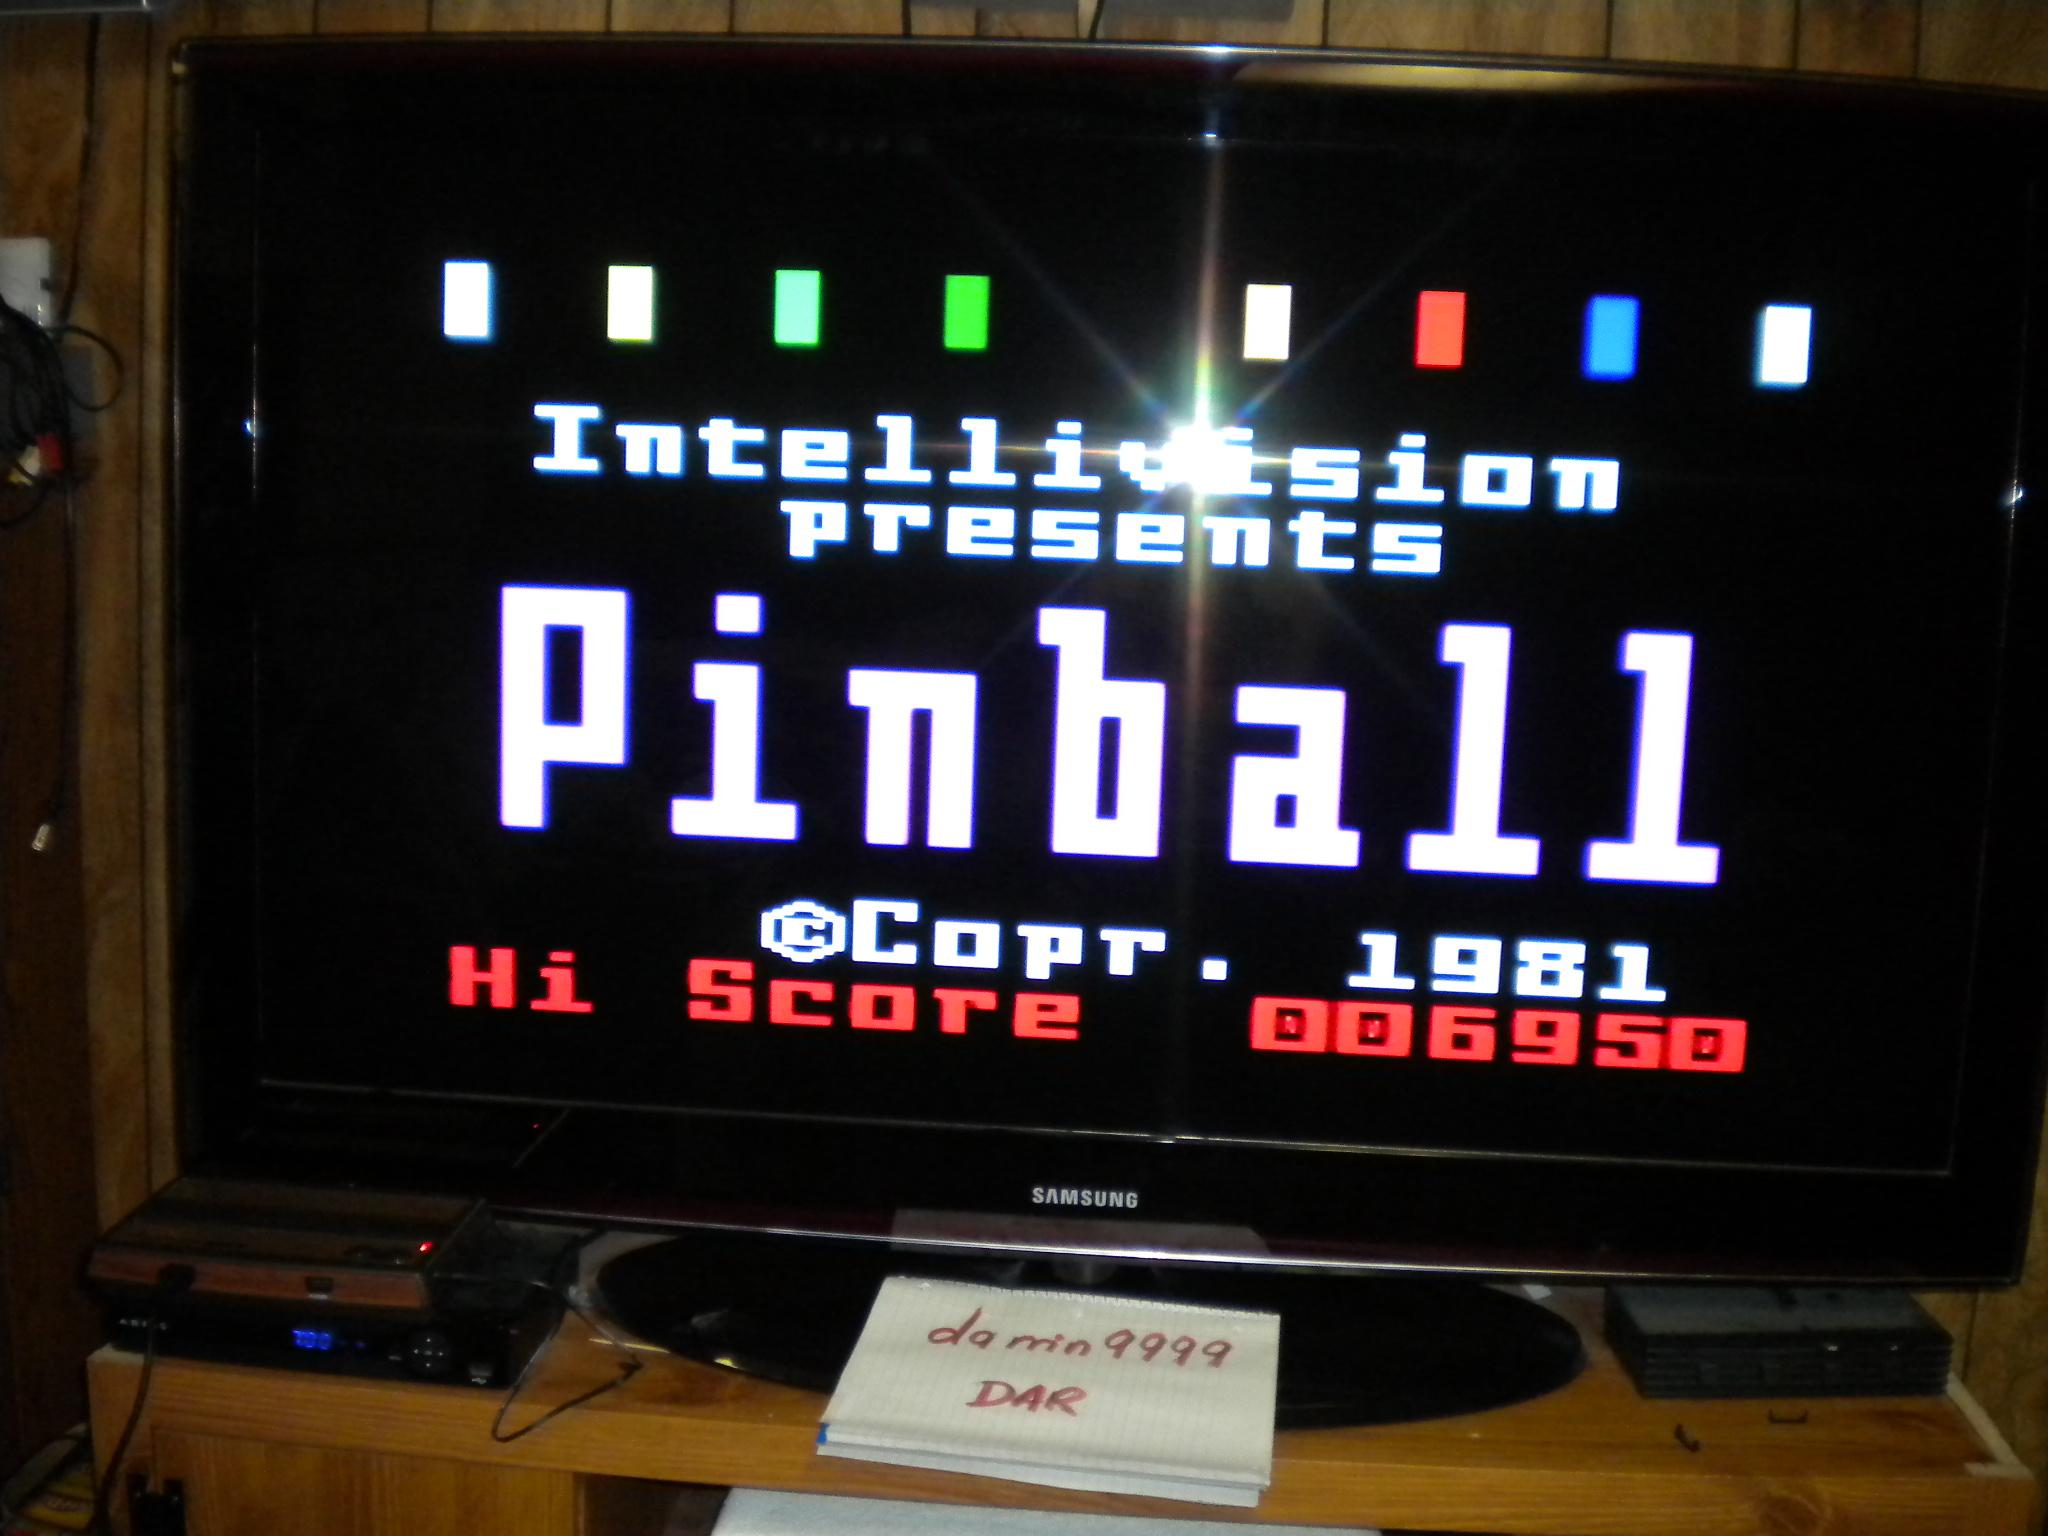 Pinball 6,950 points